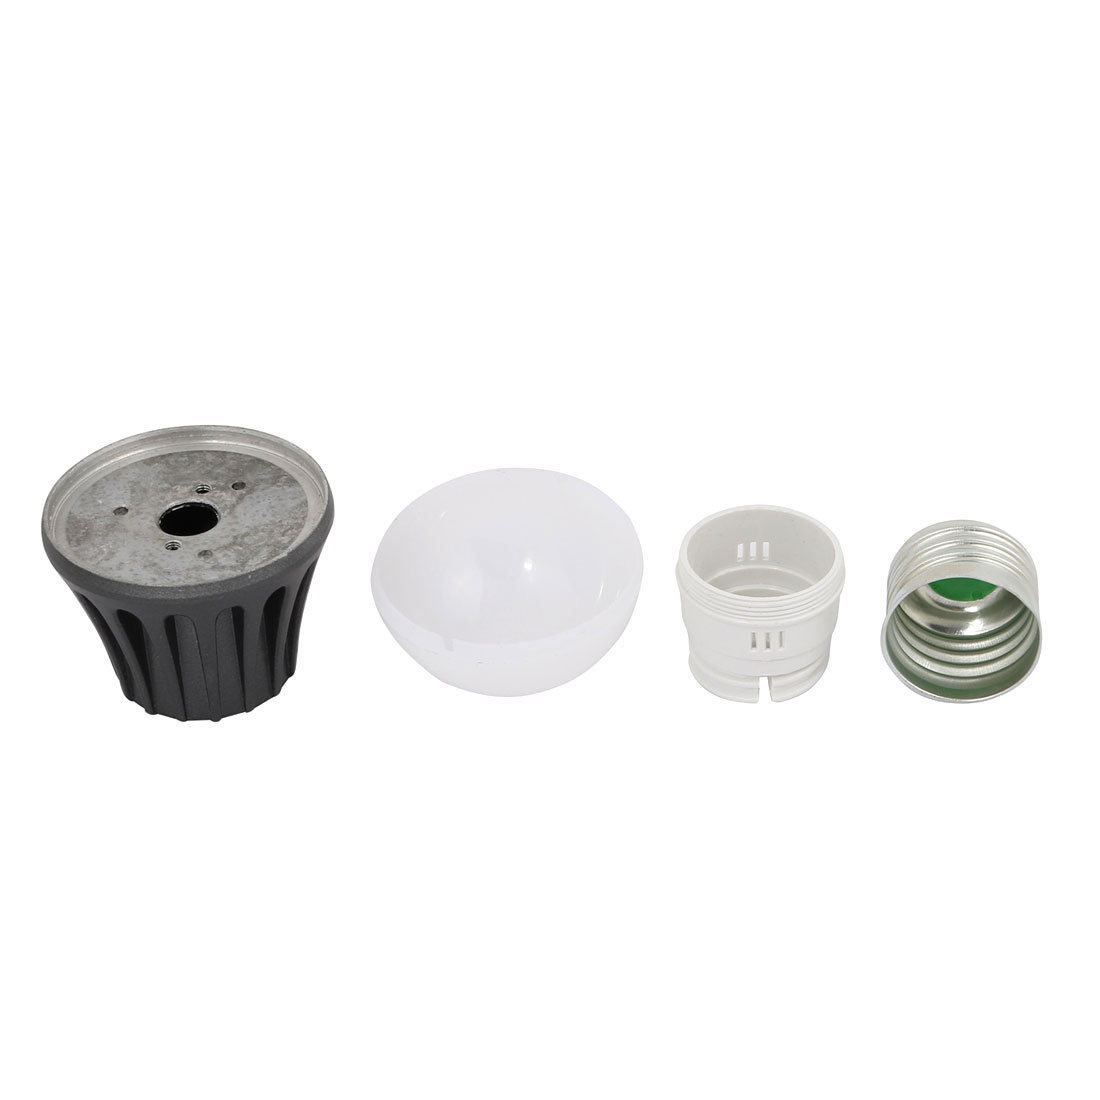 4 Pcs 3W Aluminum Alloy Black Ball - Bulb Lamp Housing E27 Base w White Cover - image 1 of 4